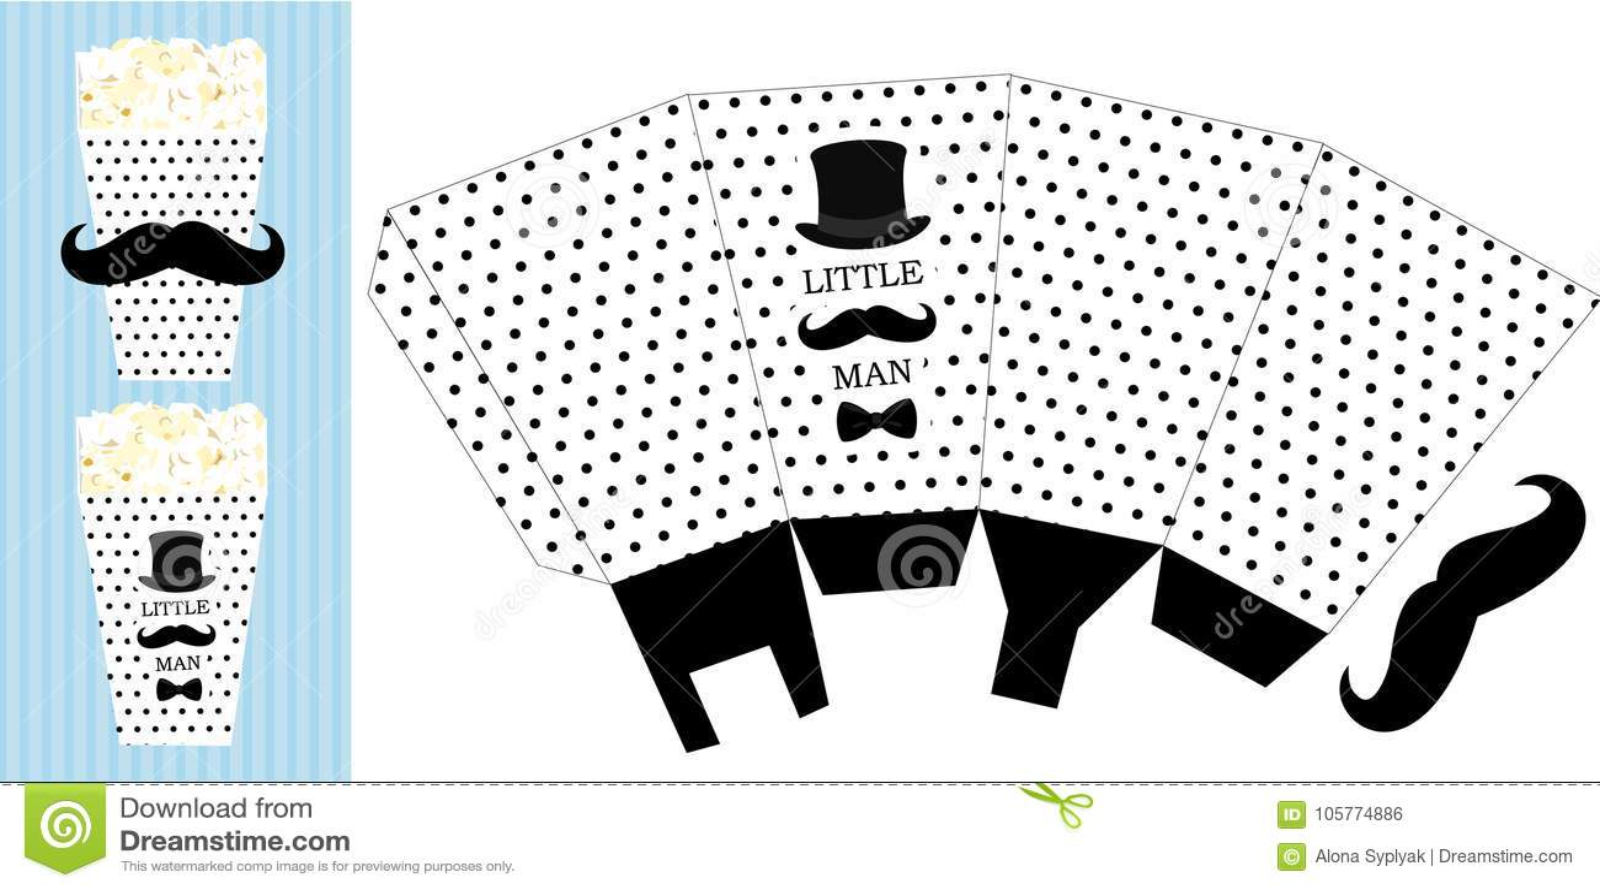 photograph regarding Popcorn Printable named Popcorn Paper Box. Printable Template For Small Guy`s